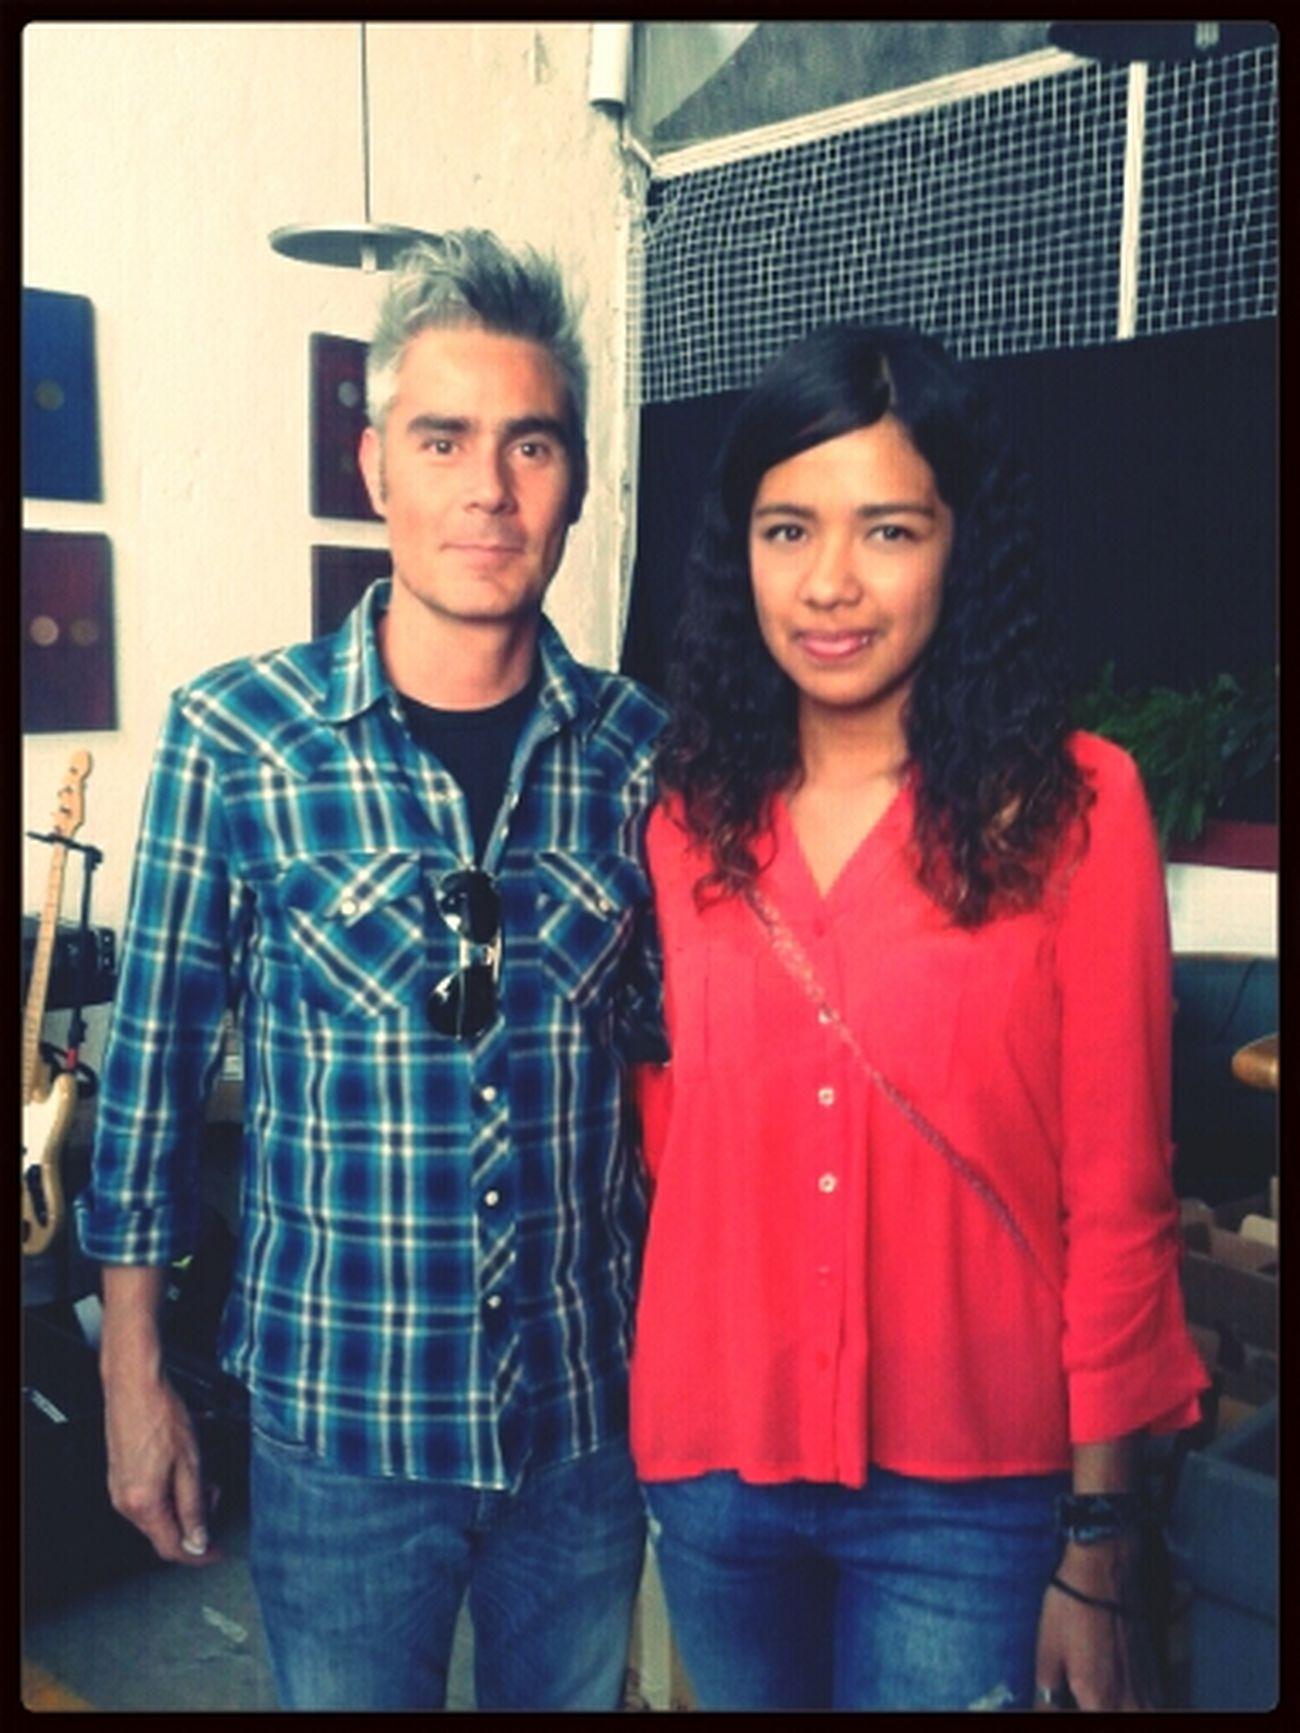 w/ my Crush @Danielgutierrez :'D I finally meet him! ♡